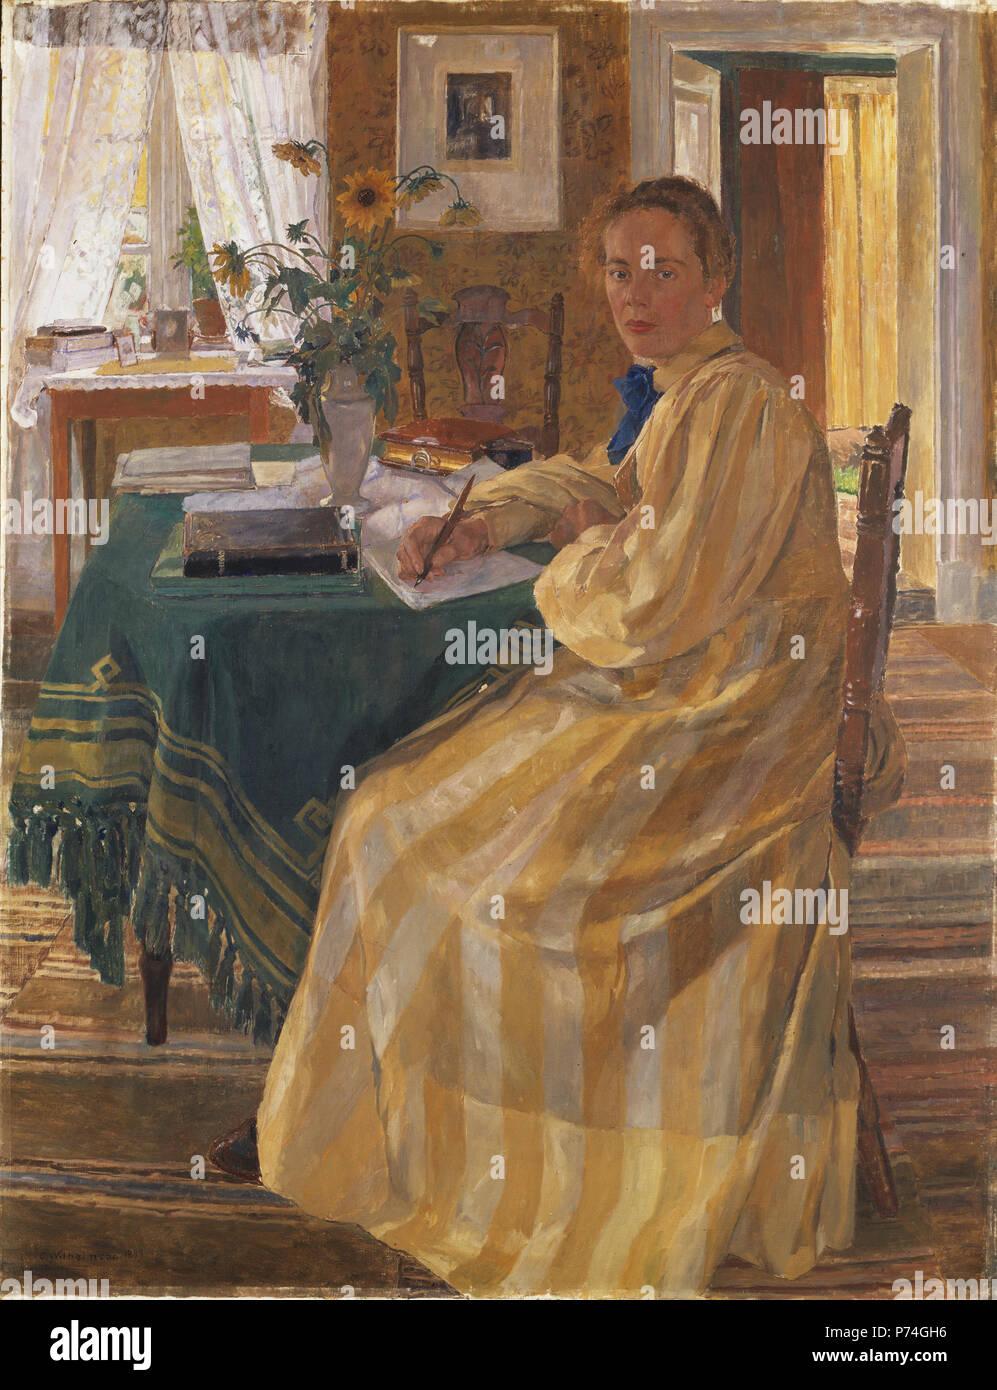 Englisch Des Künstlers Schwester Svenska Konstnärens Syster